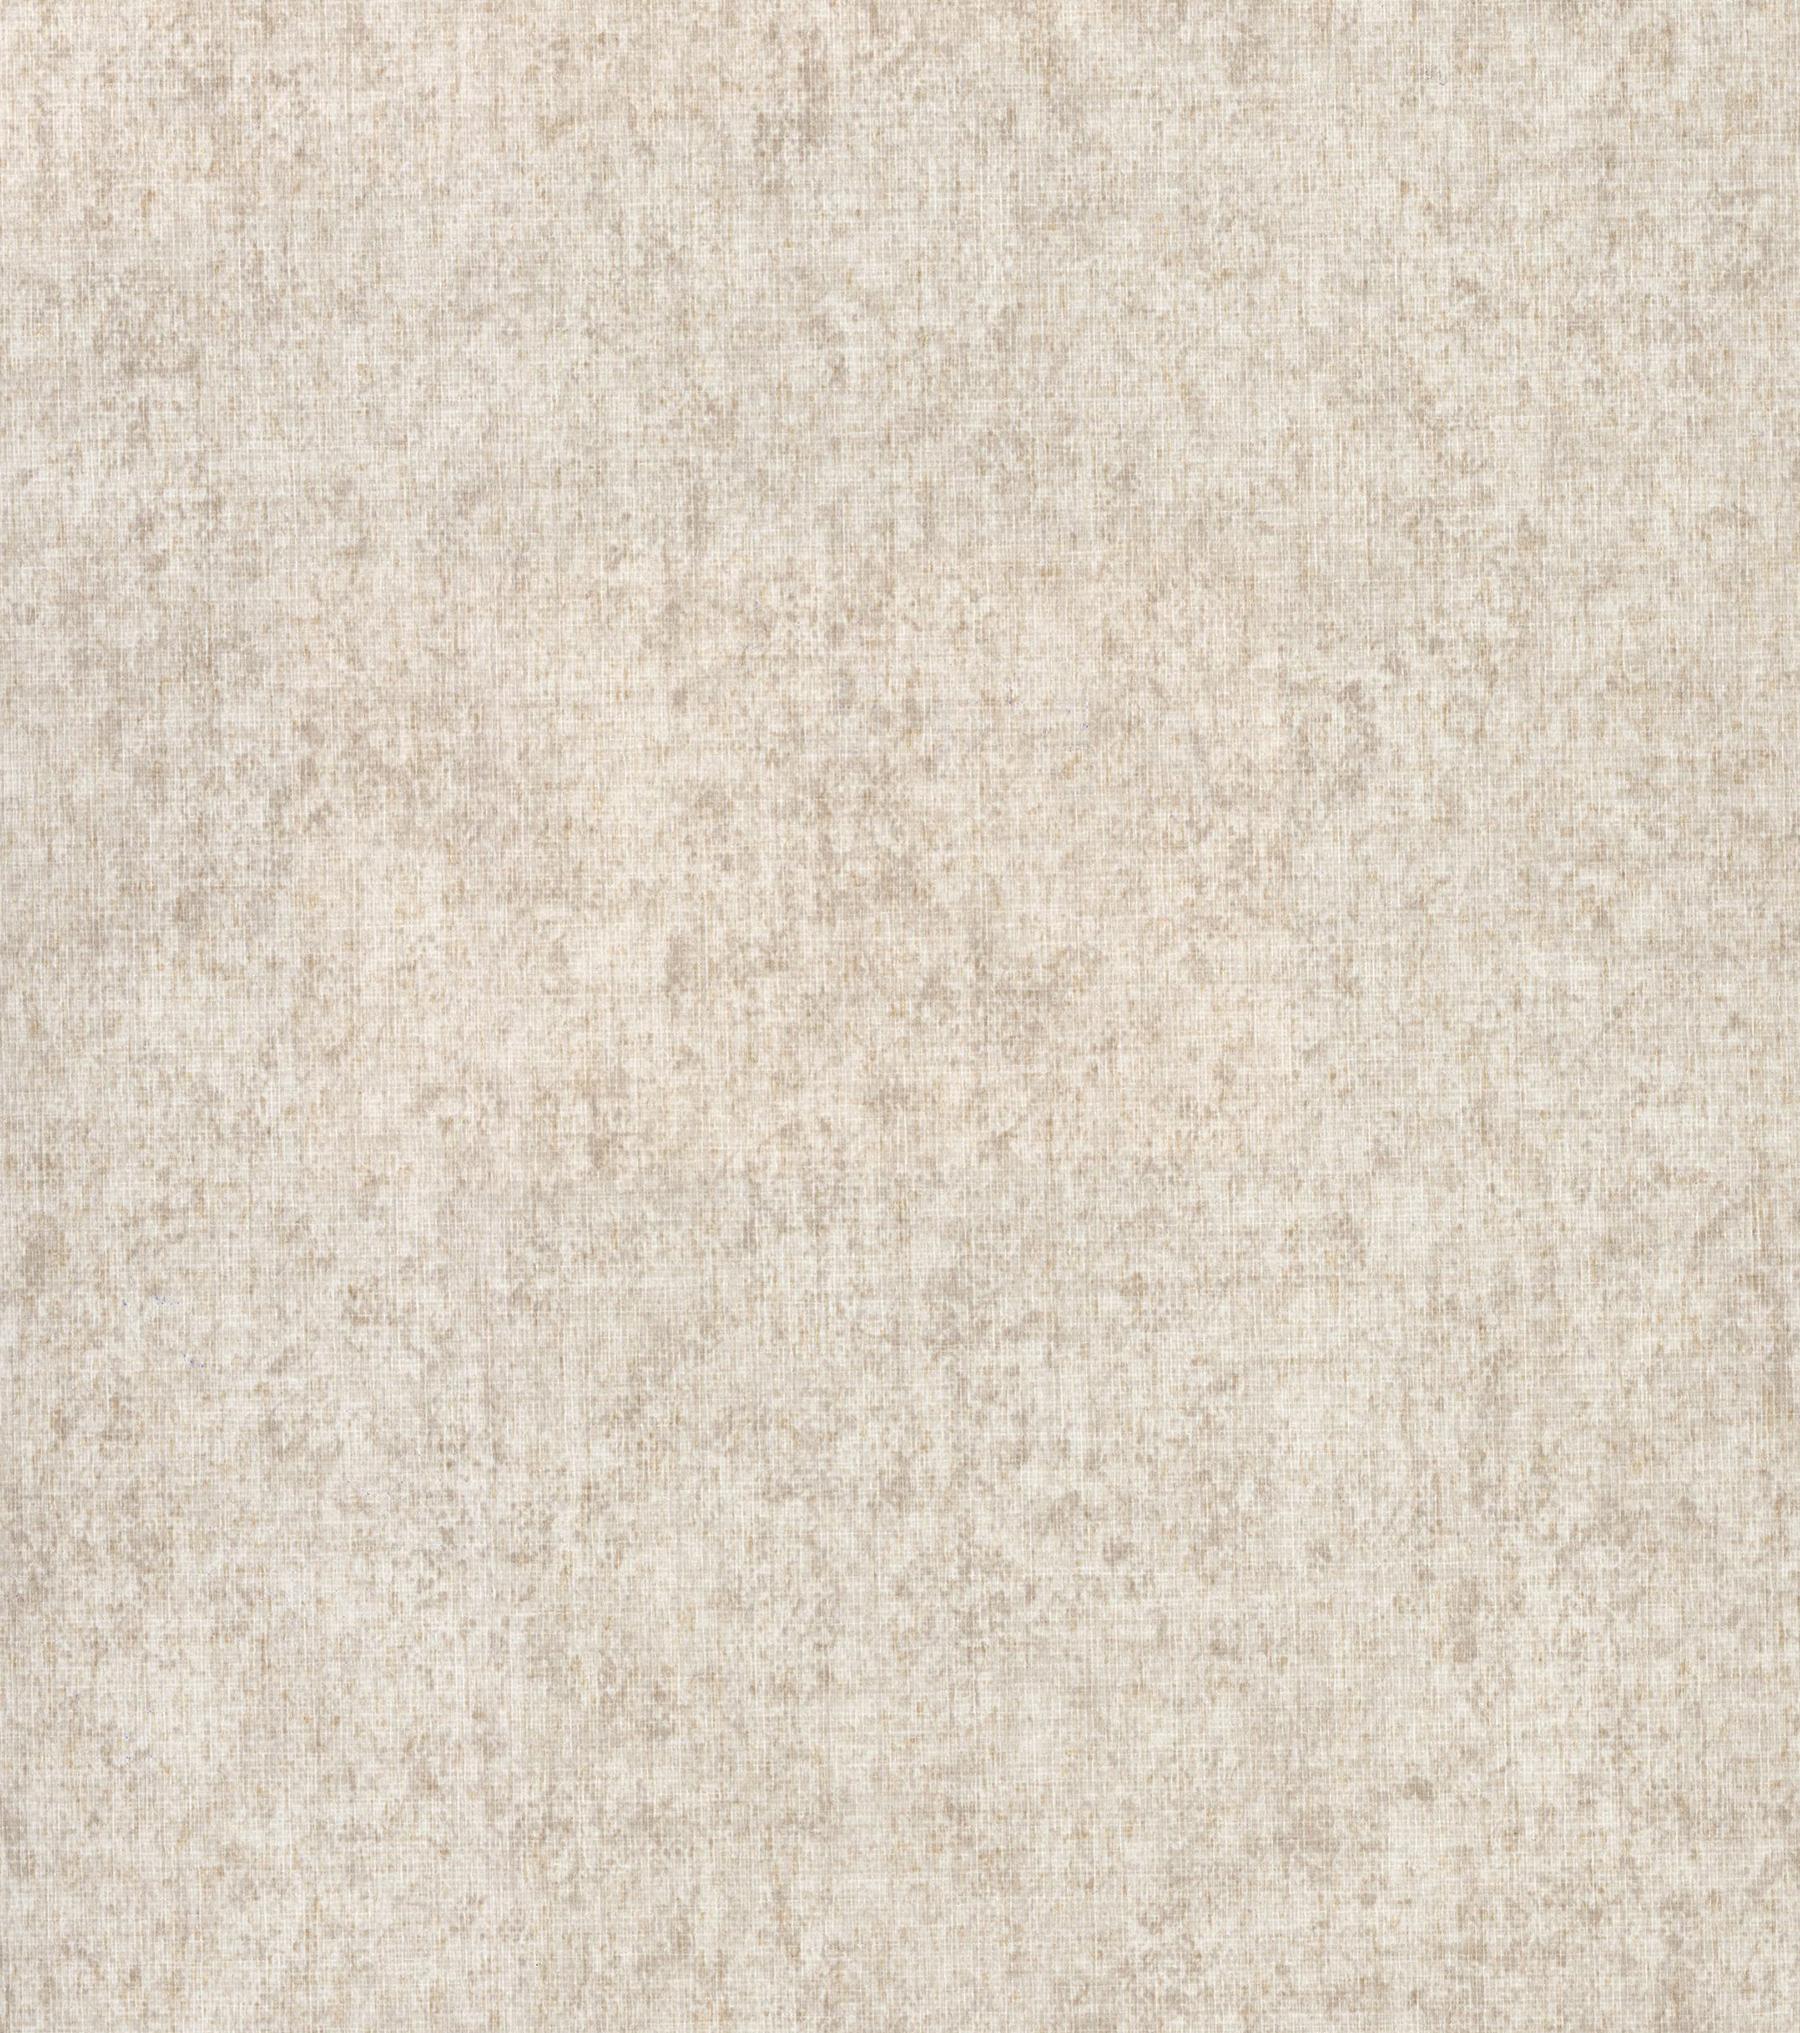 Picture of Brienne Beige Linen Texture Wallpaper